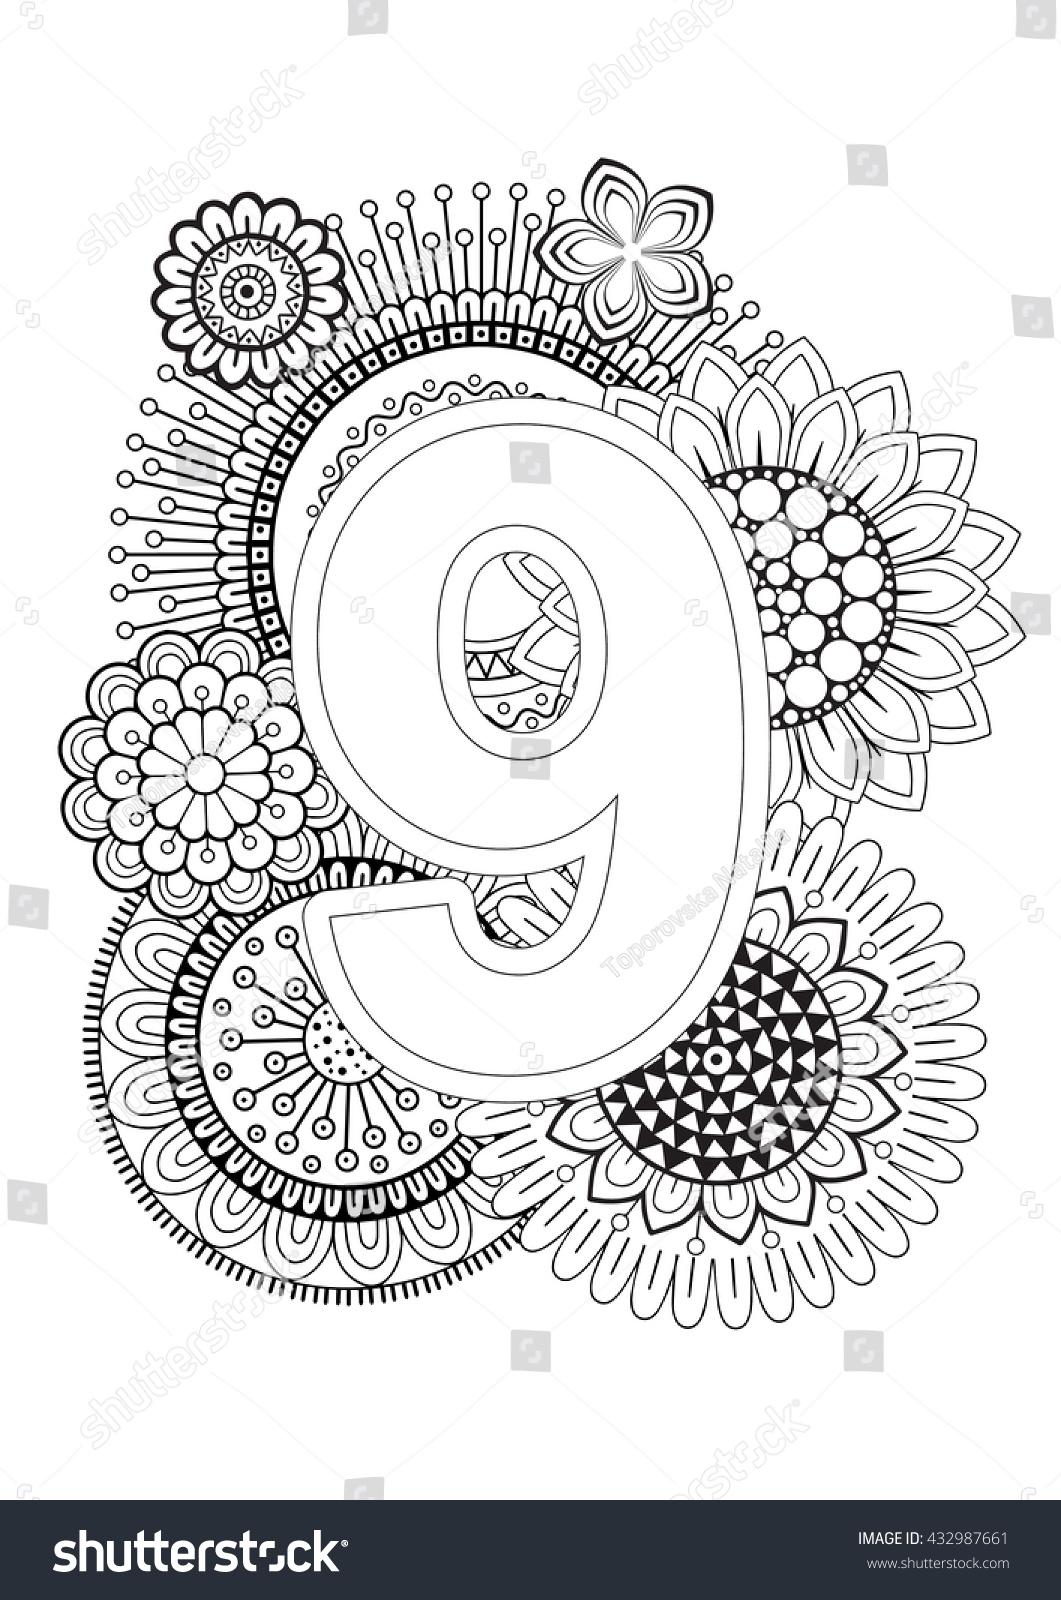 doodle floral letters coloring book adult stock vector 432987661 shutterstock. Black Bedroom Furniture Sets. Home Design Ideas